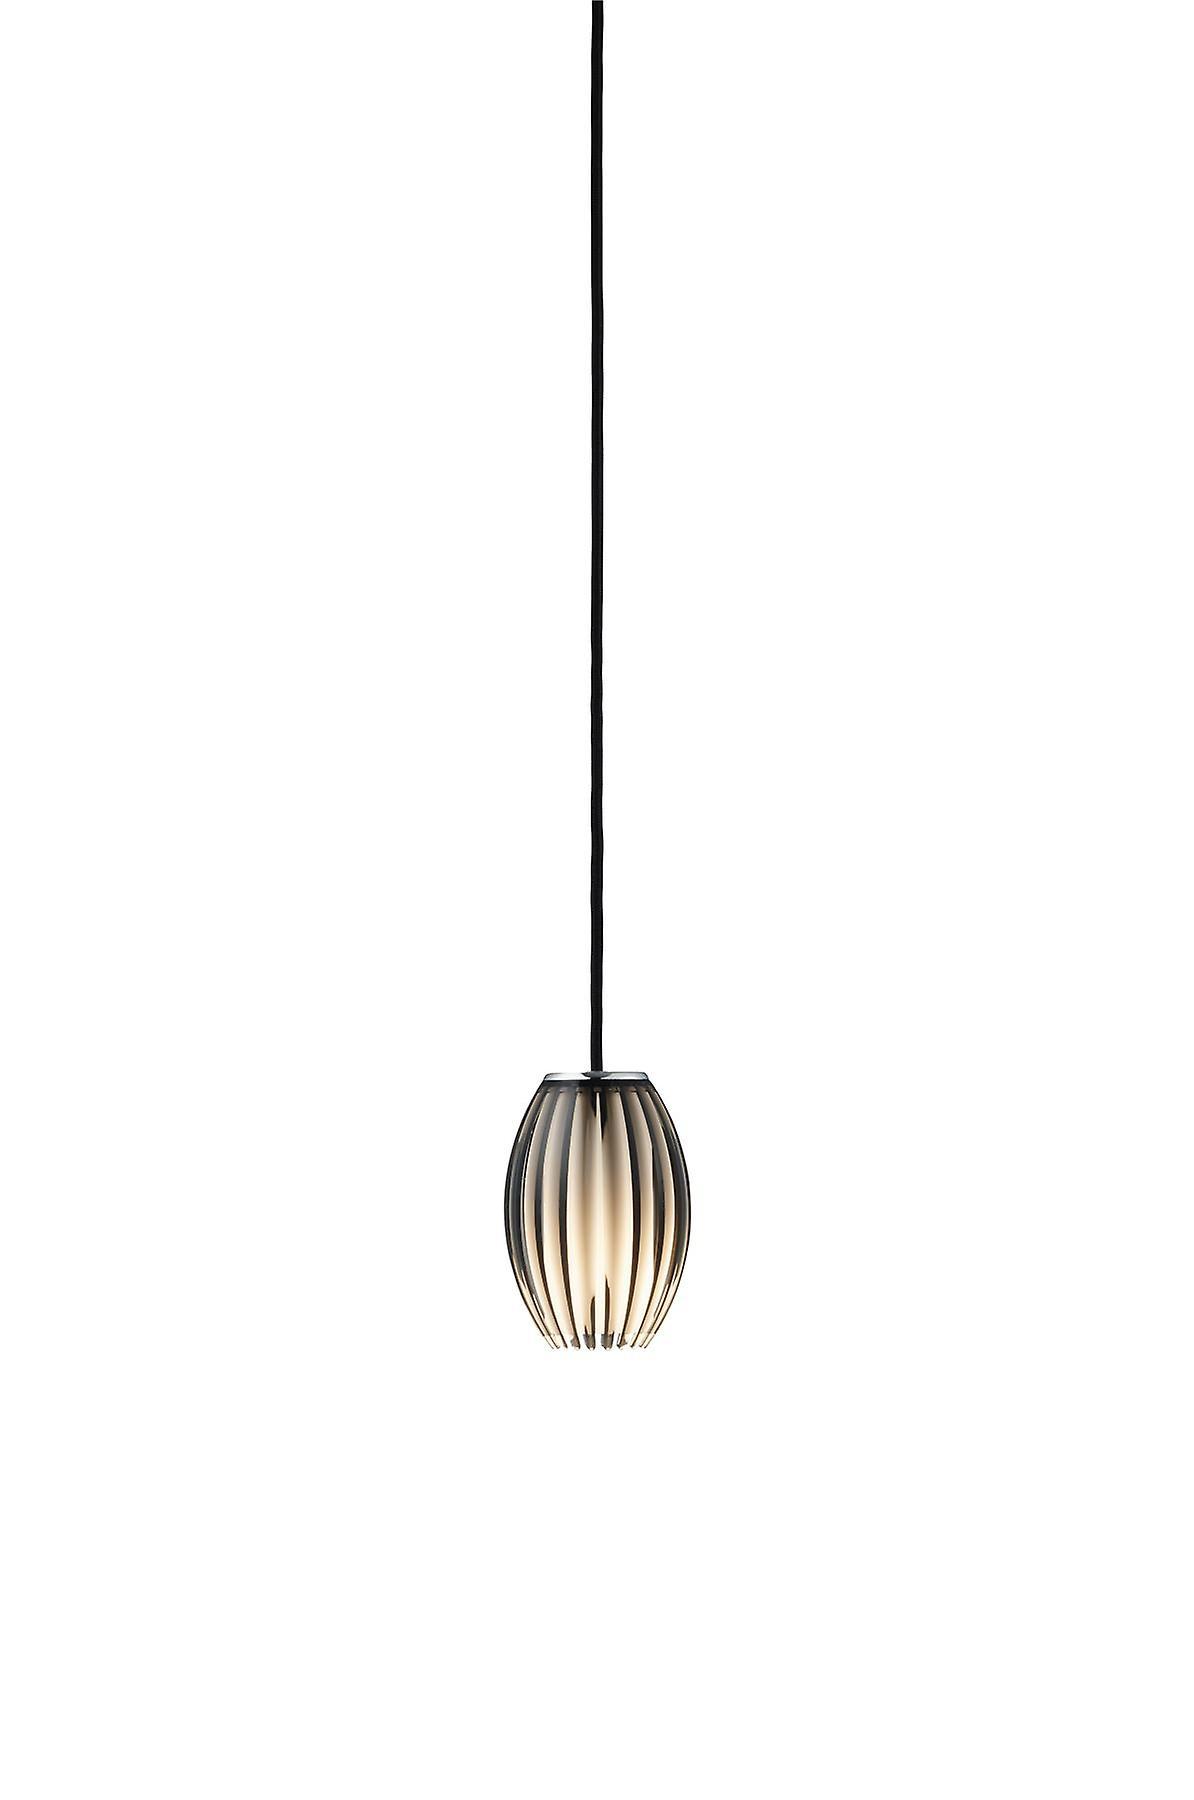 Herstal - Tentacle LED pendentif lumière Smoke Finish 6982140164